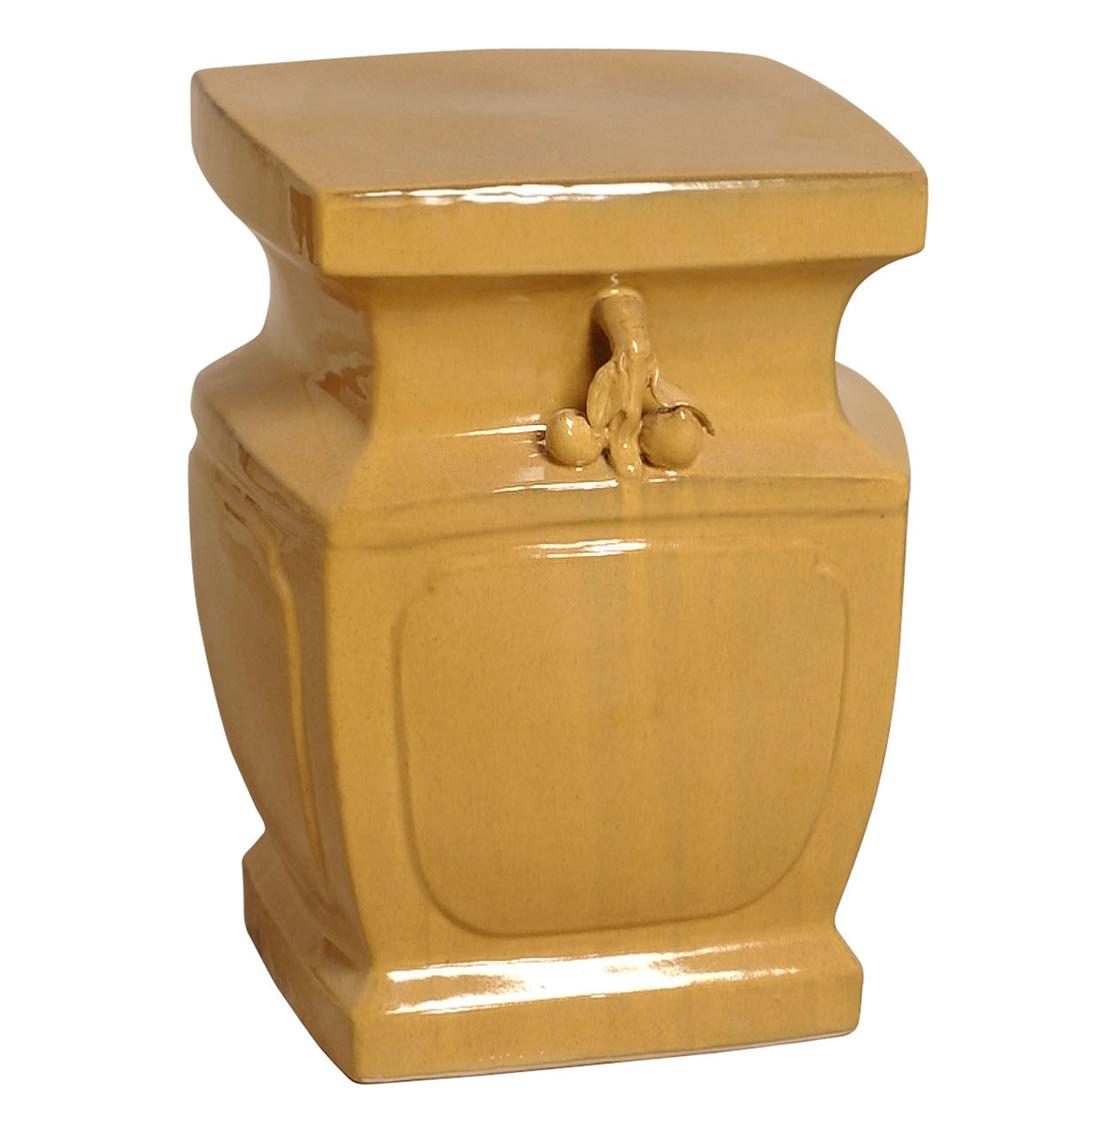 Double Peach Yellow Orange Asian Inspired Garden Stool Seat